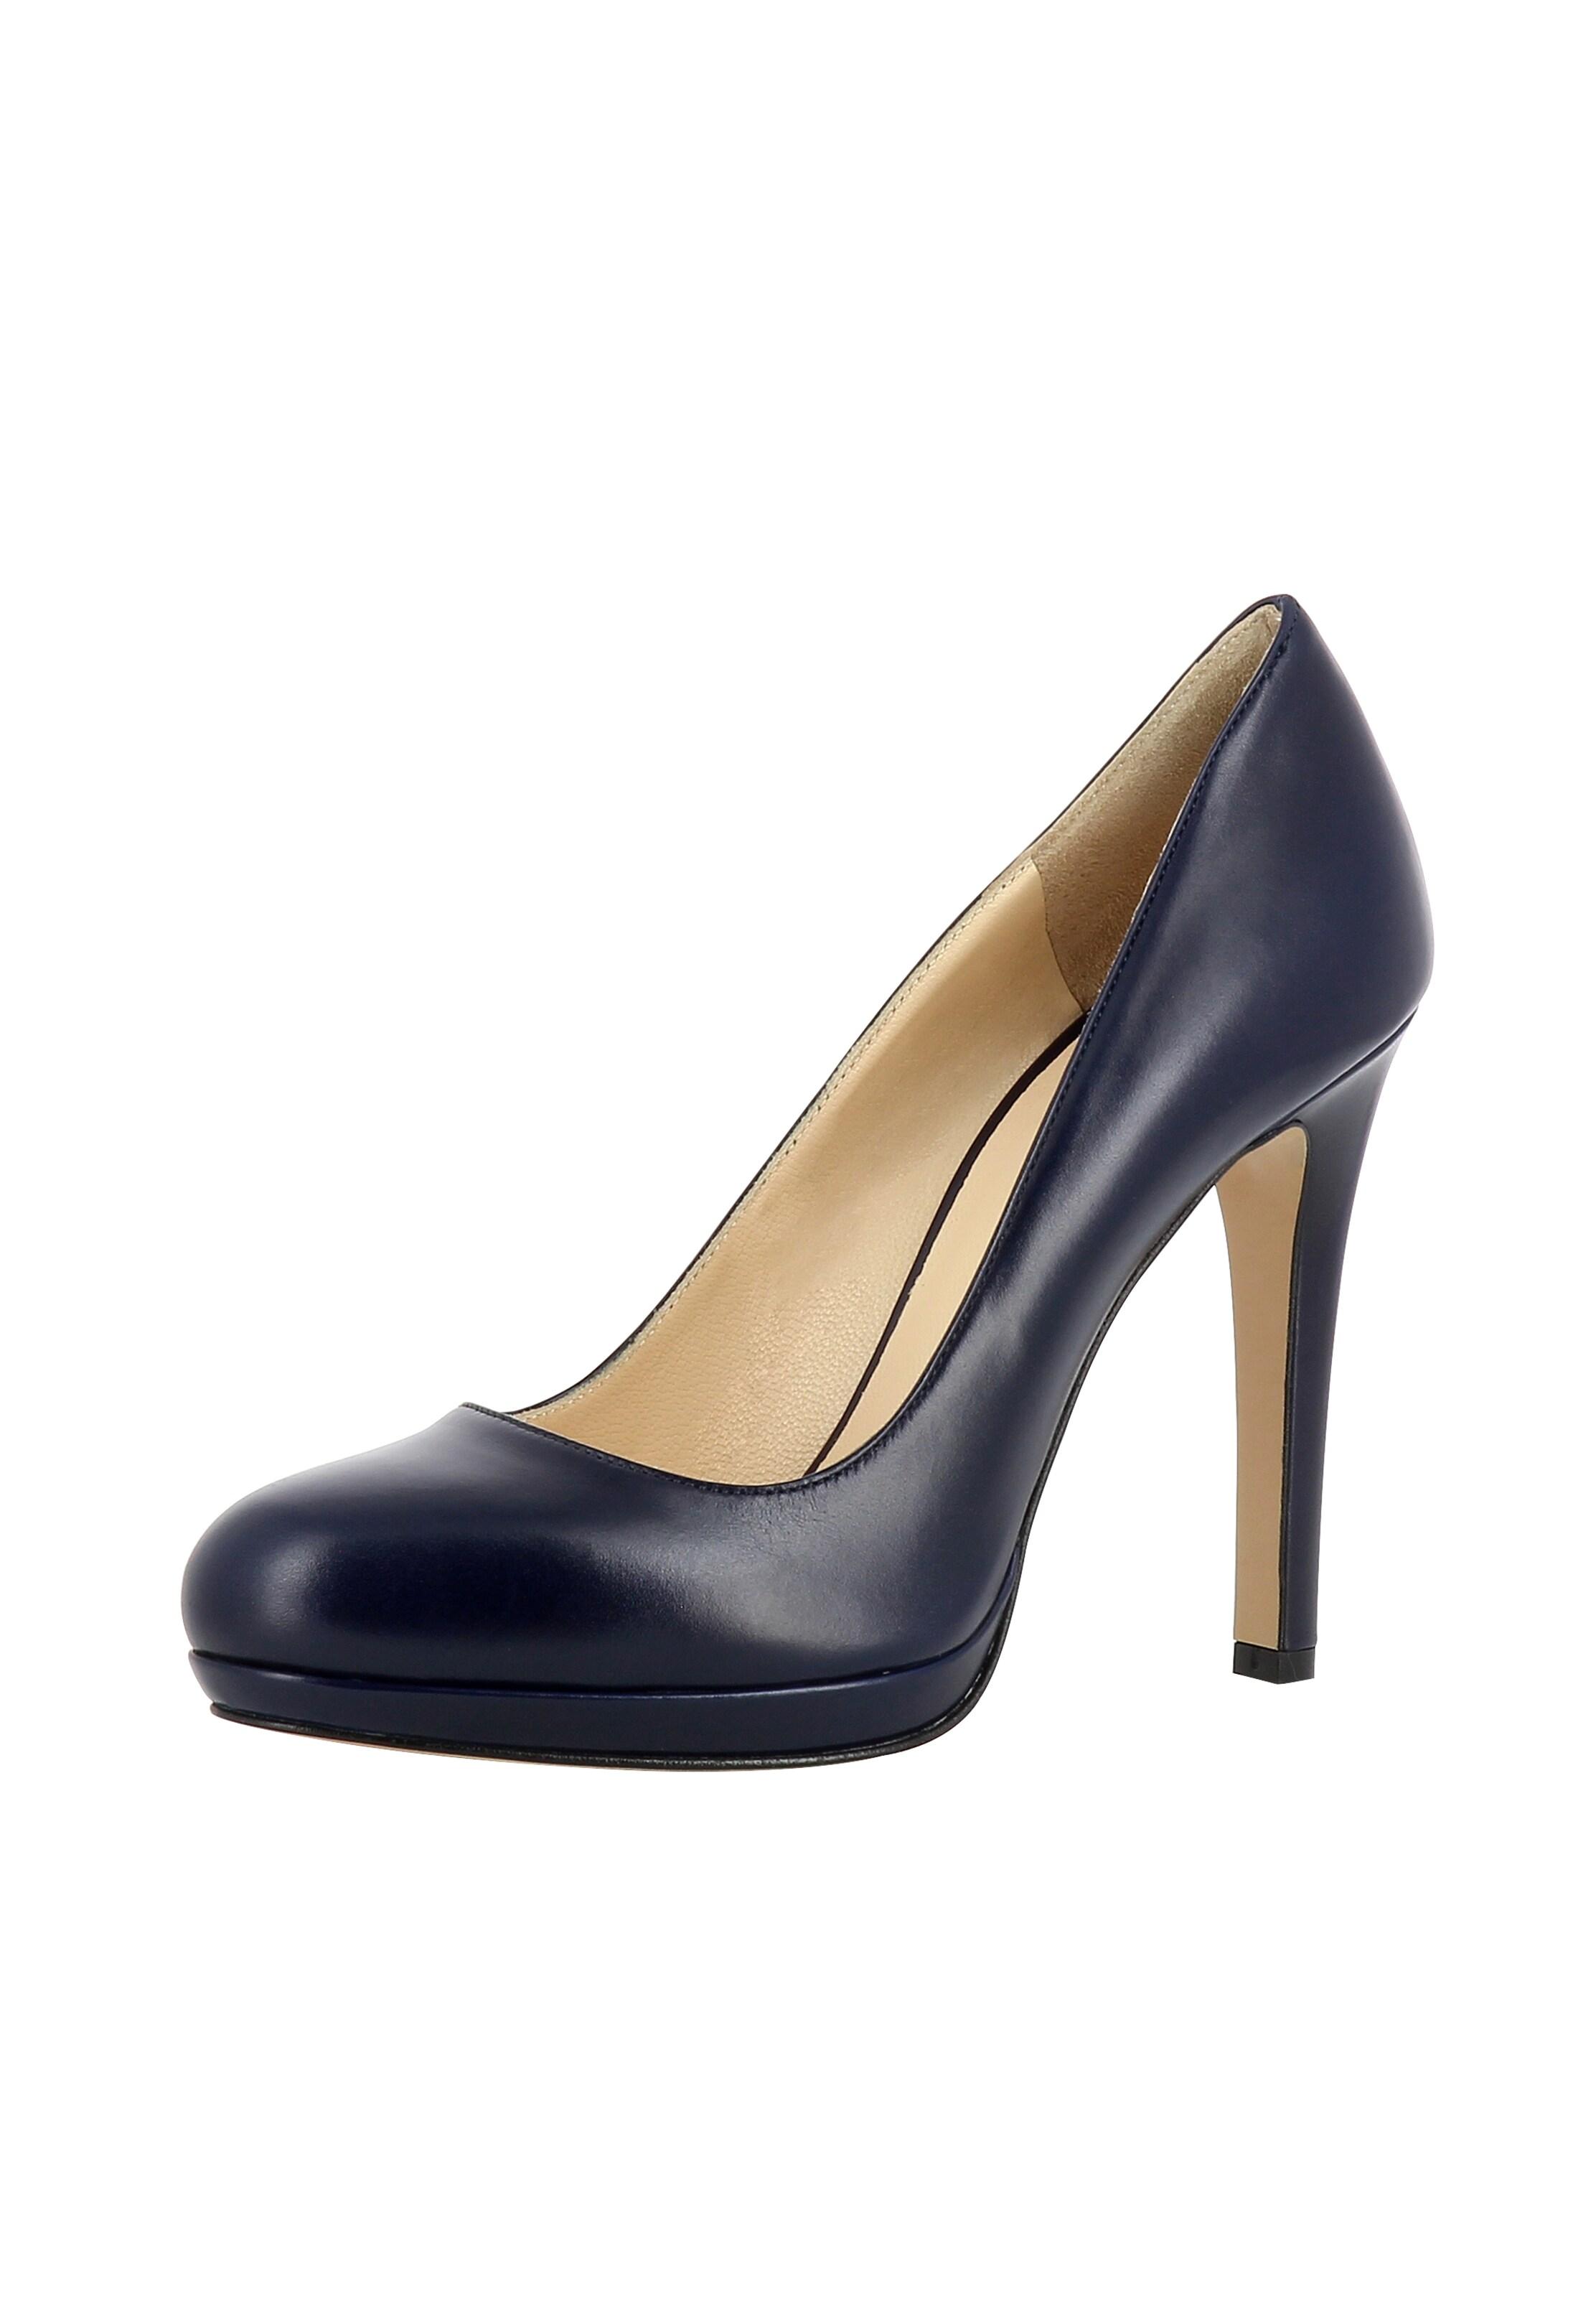 Haltbare Mode billige Schuhe EVITA | Damen Pumps 'CRISTINA' Schuhe Gut getragene Schuhe